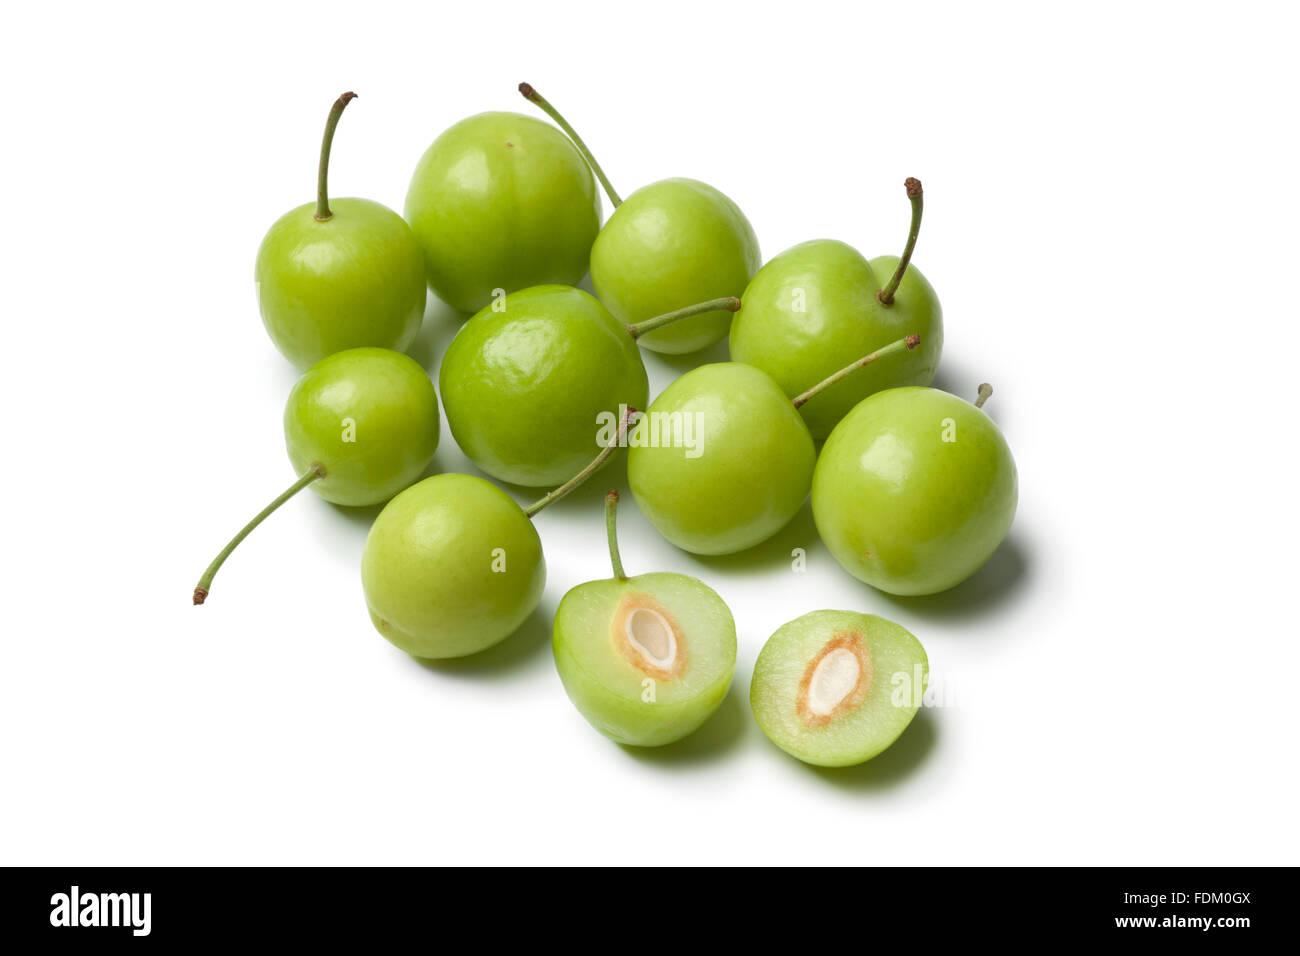 Fresh Can Erik plums on white background - Stock Image